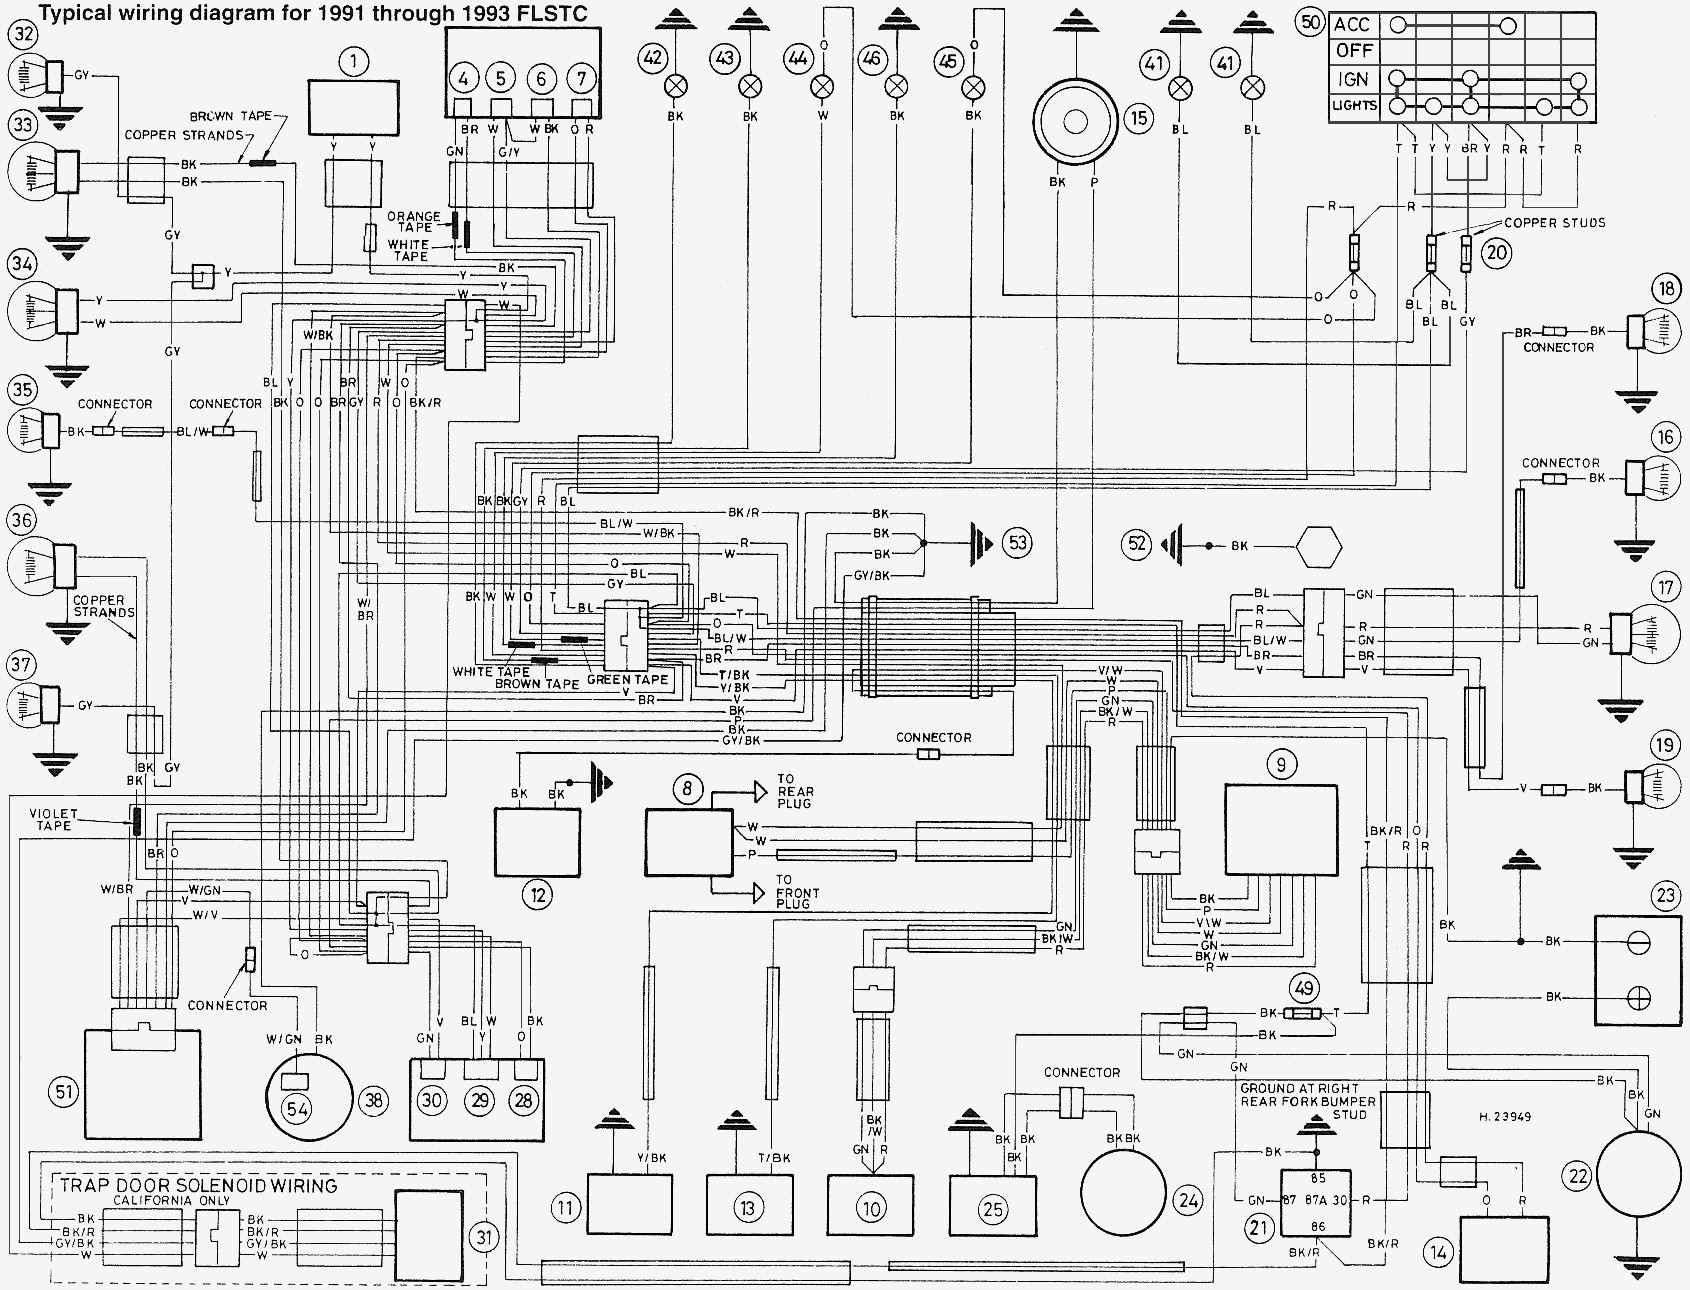 1986 harley sportster wiring diagram alpine type s heritage softail best library 92 1987 davidson